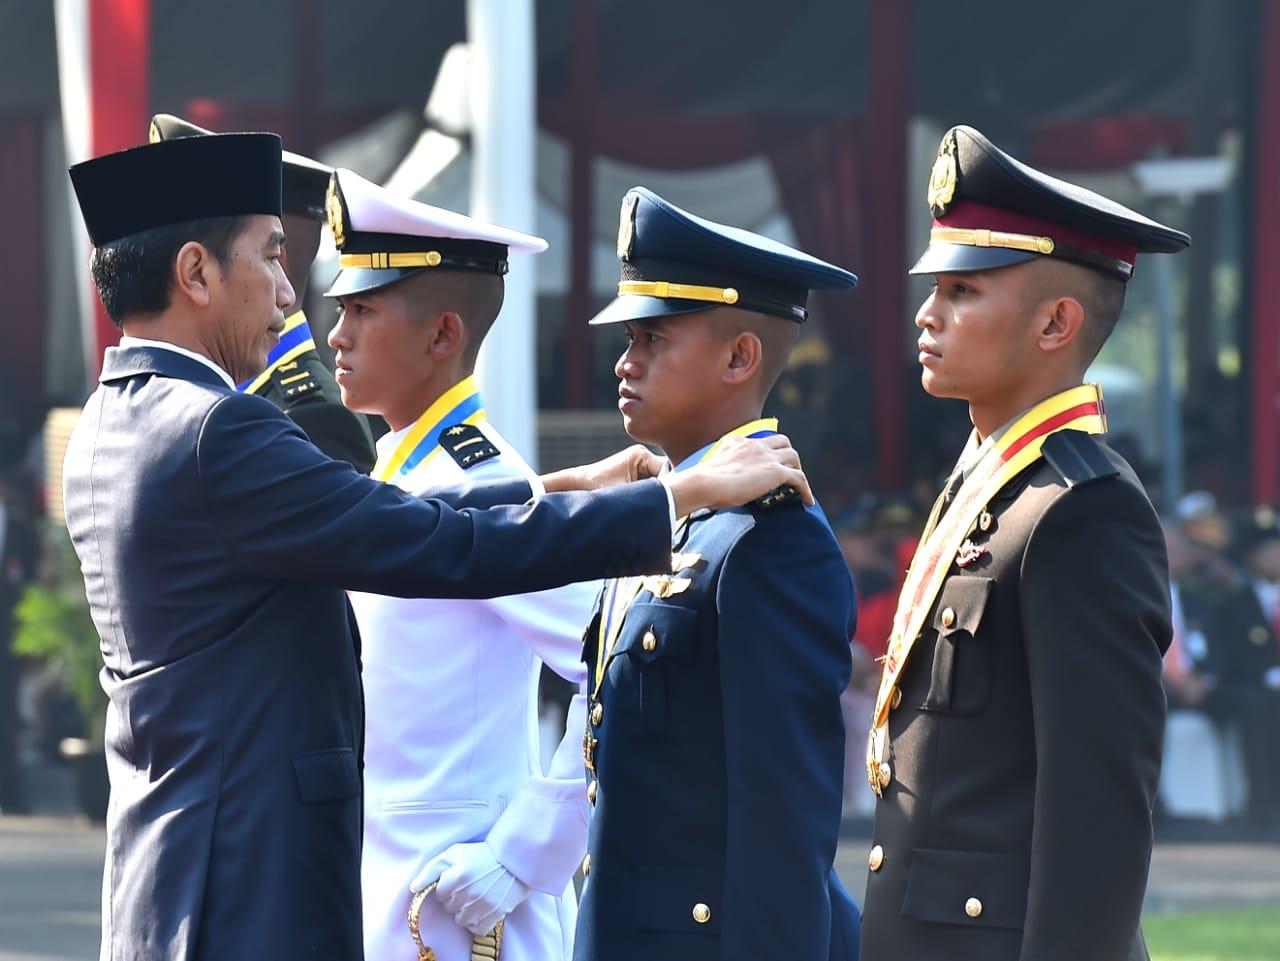 Lantik Perwira TNI-Polri, Presiden Jokowi: Prajurit Harus Ikuti Perkembangan Zaman Dalam Hadapi Tantangan Global